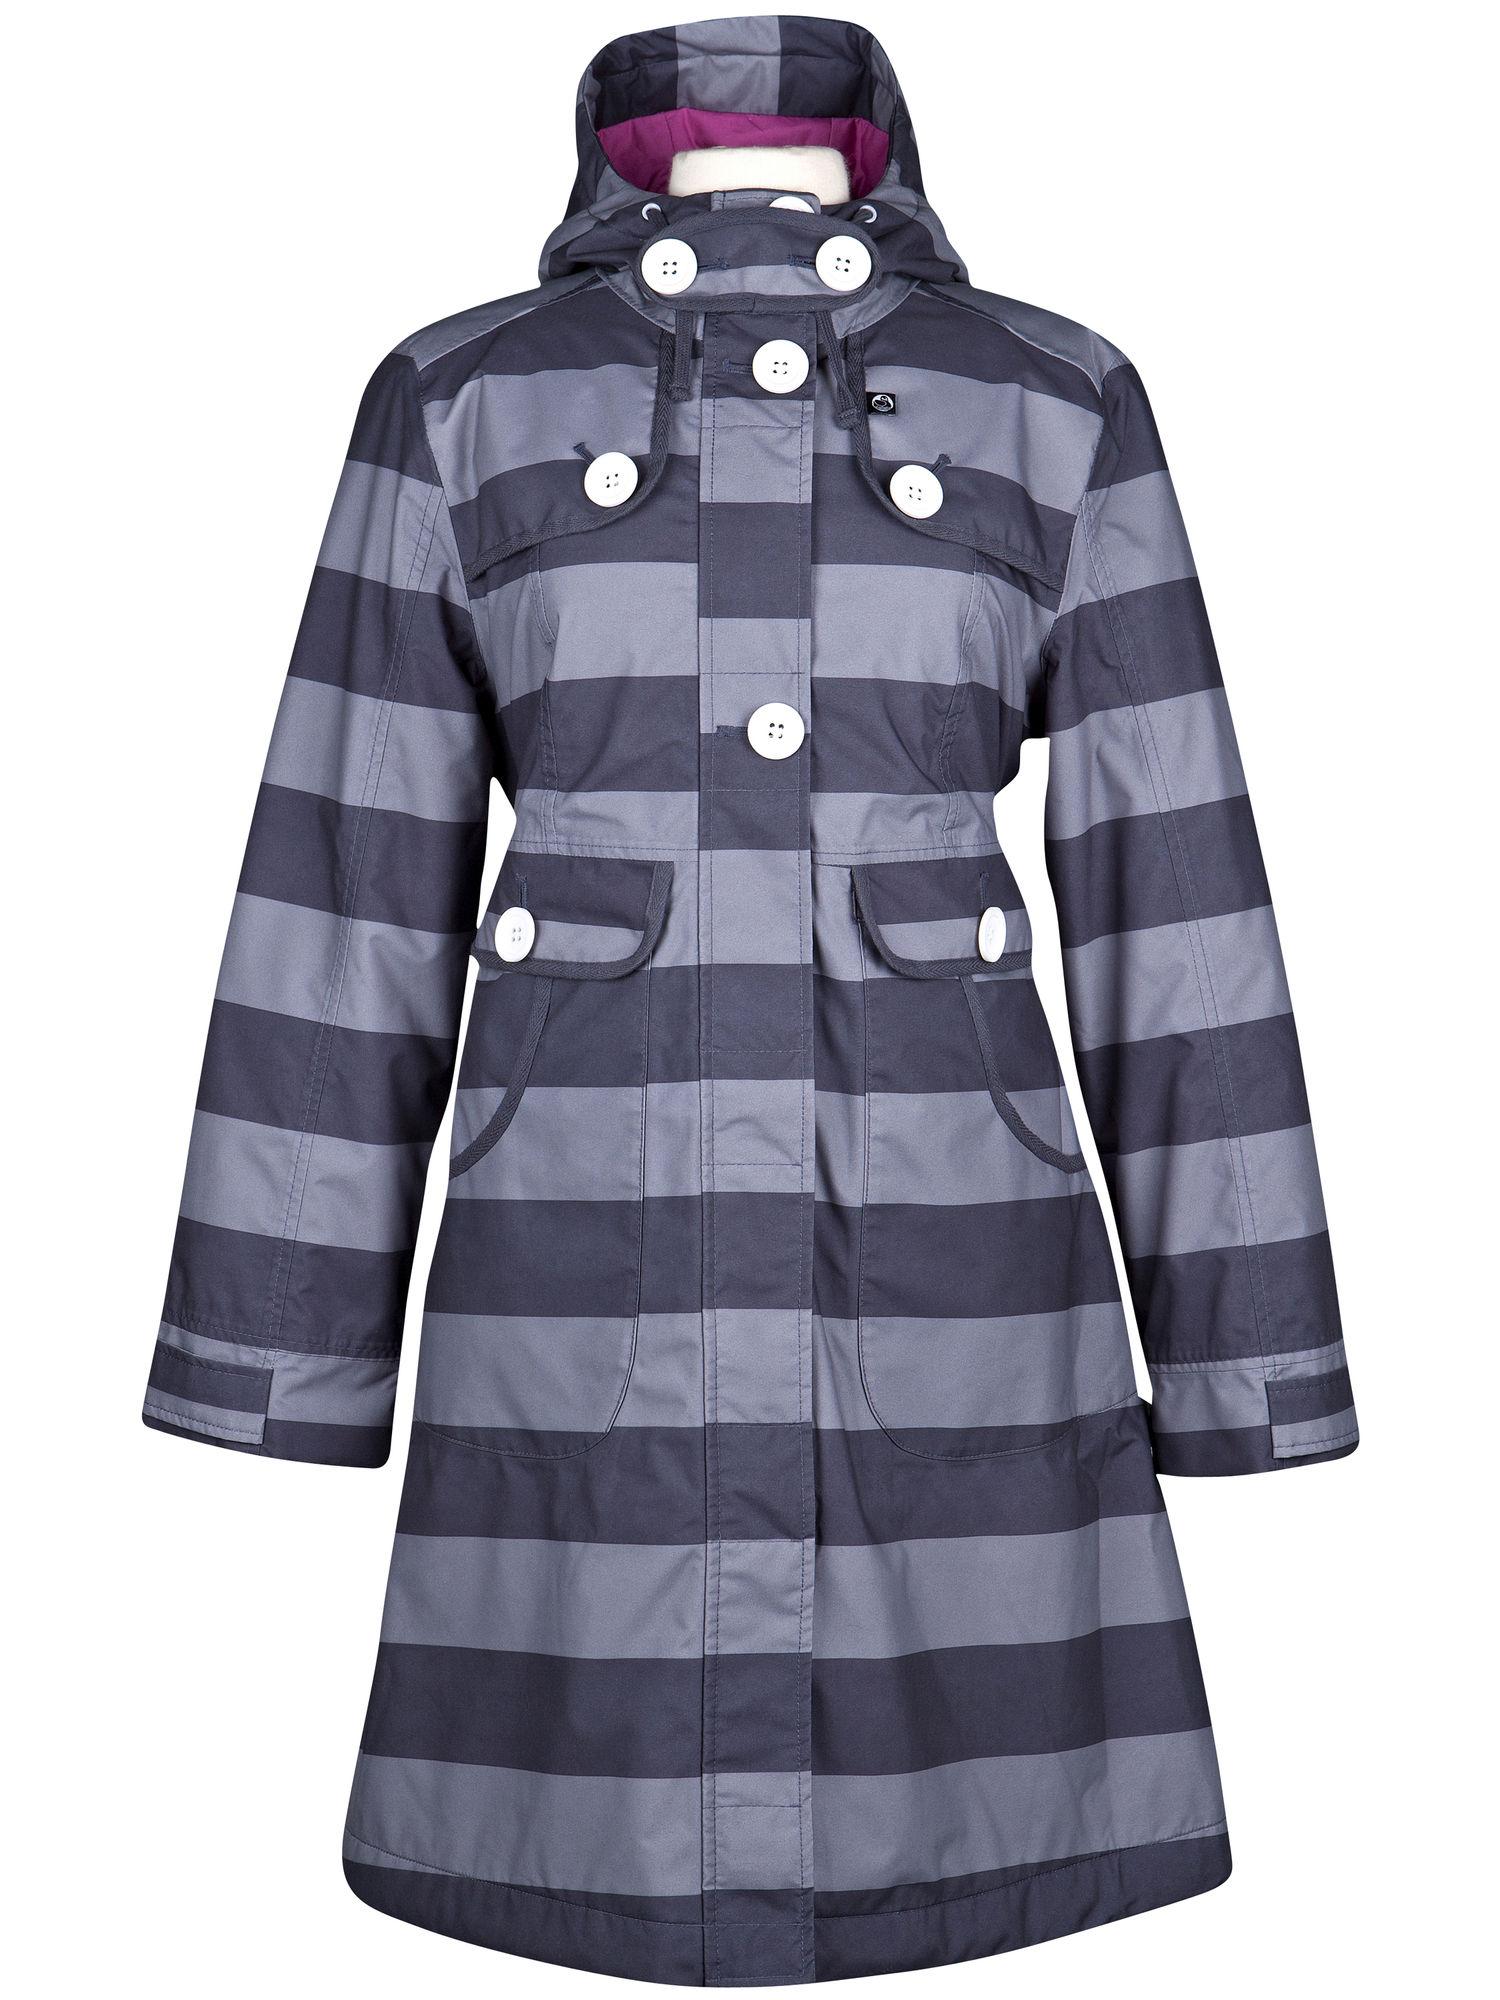 Image of   Else Winter Jacket Dark Grey/Grey